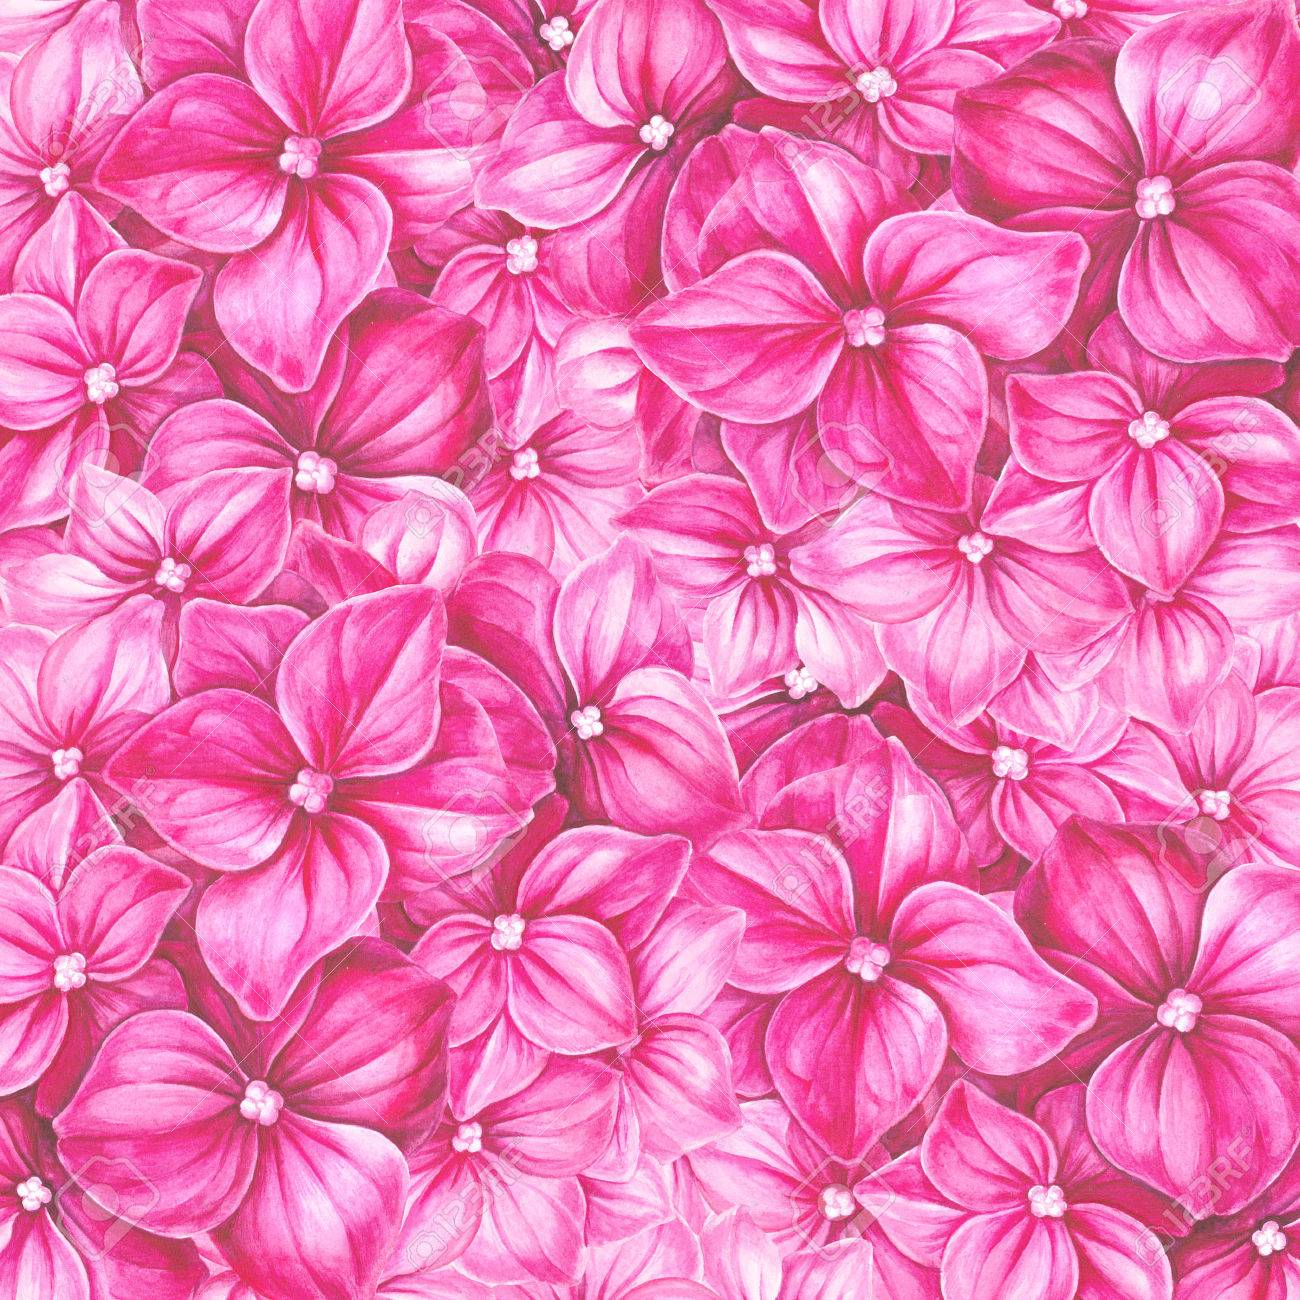 Blooming Hydrangea Flower Watercolor Illustration Cute Pink